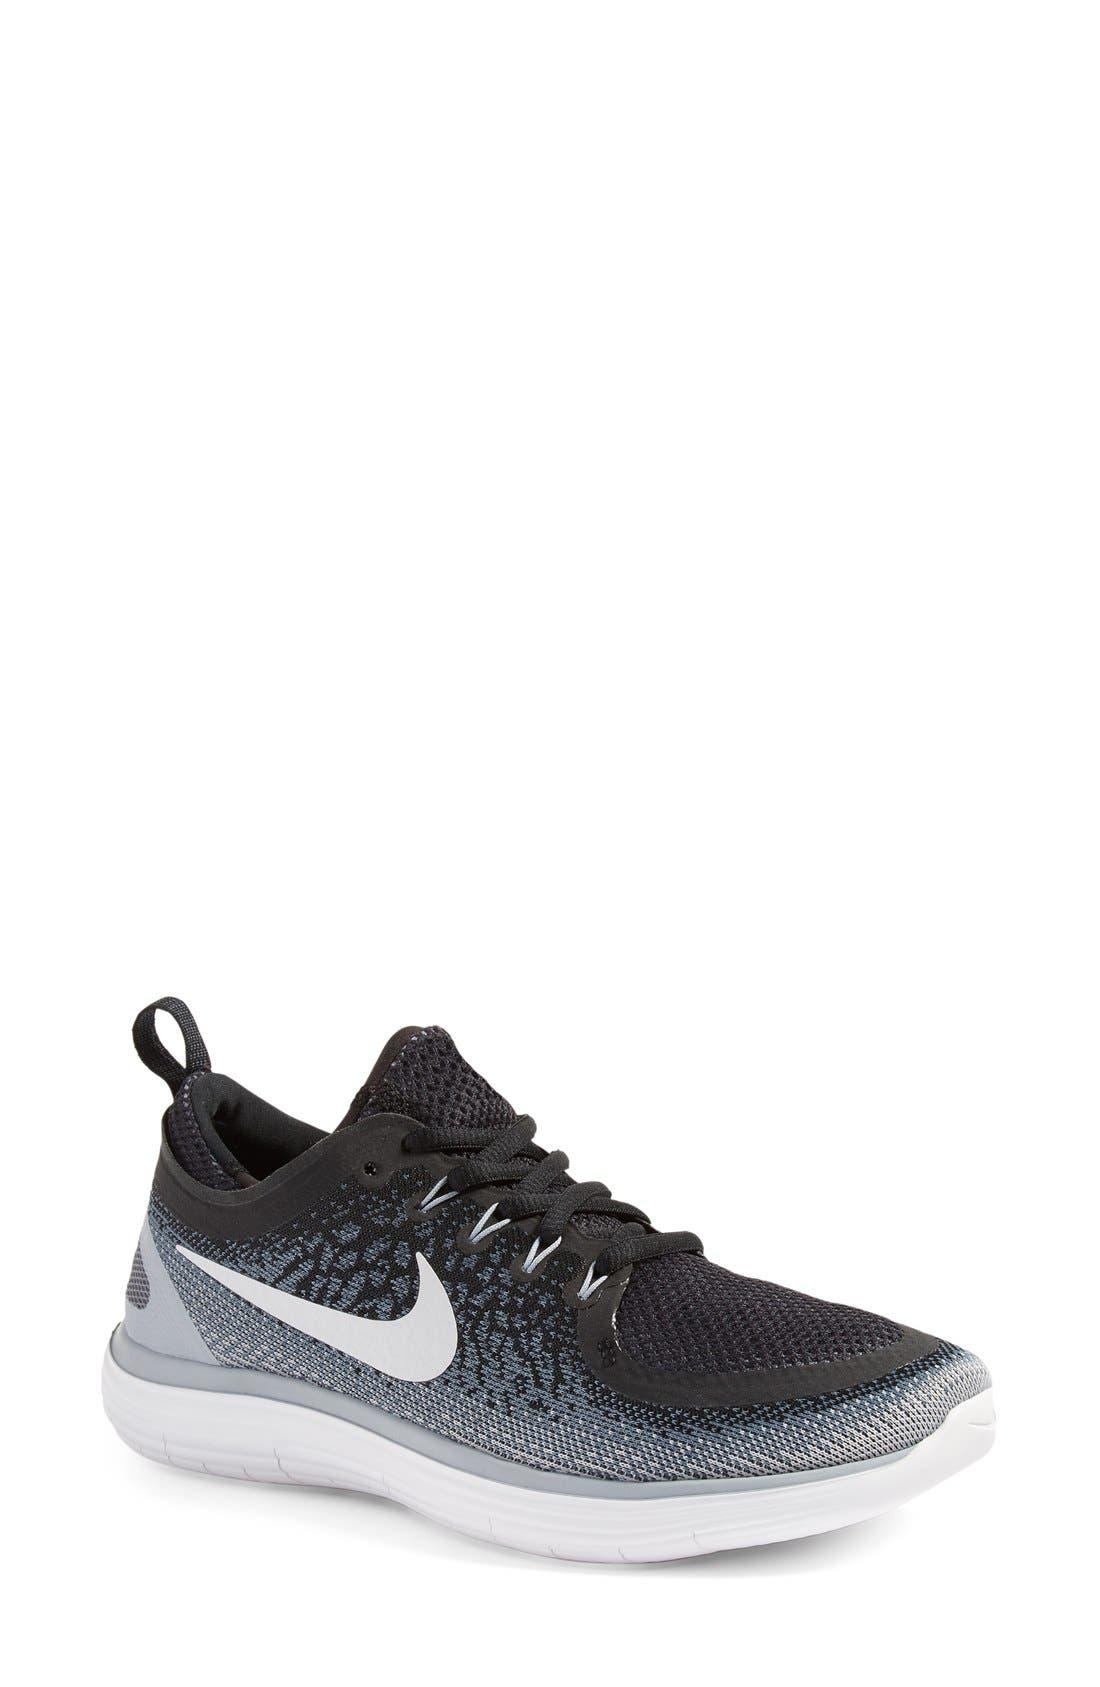 Free Run Distance 2 Running Shoe,                         Main,                         color, 001